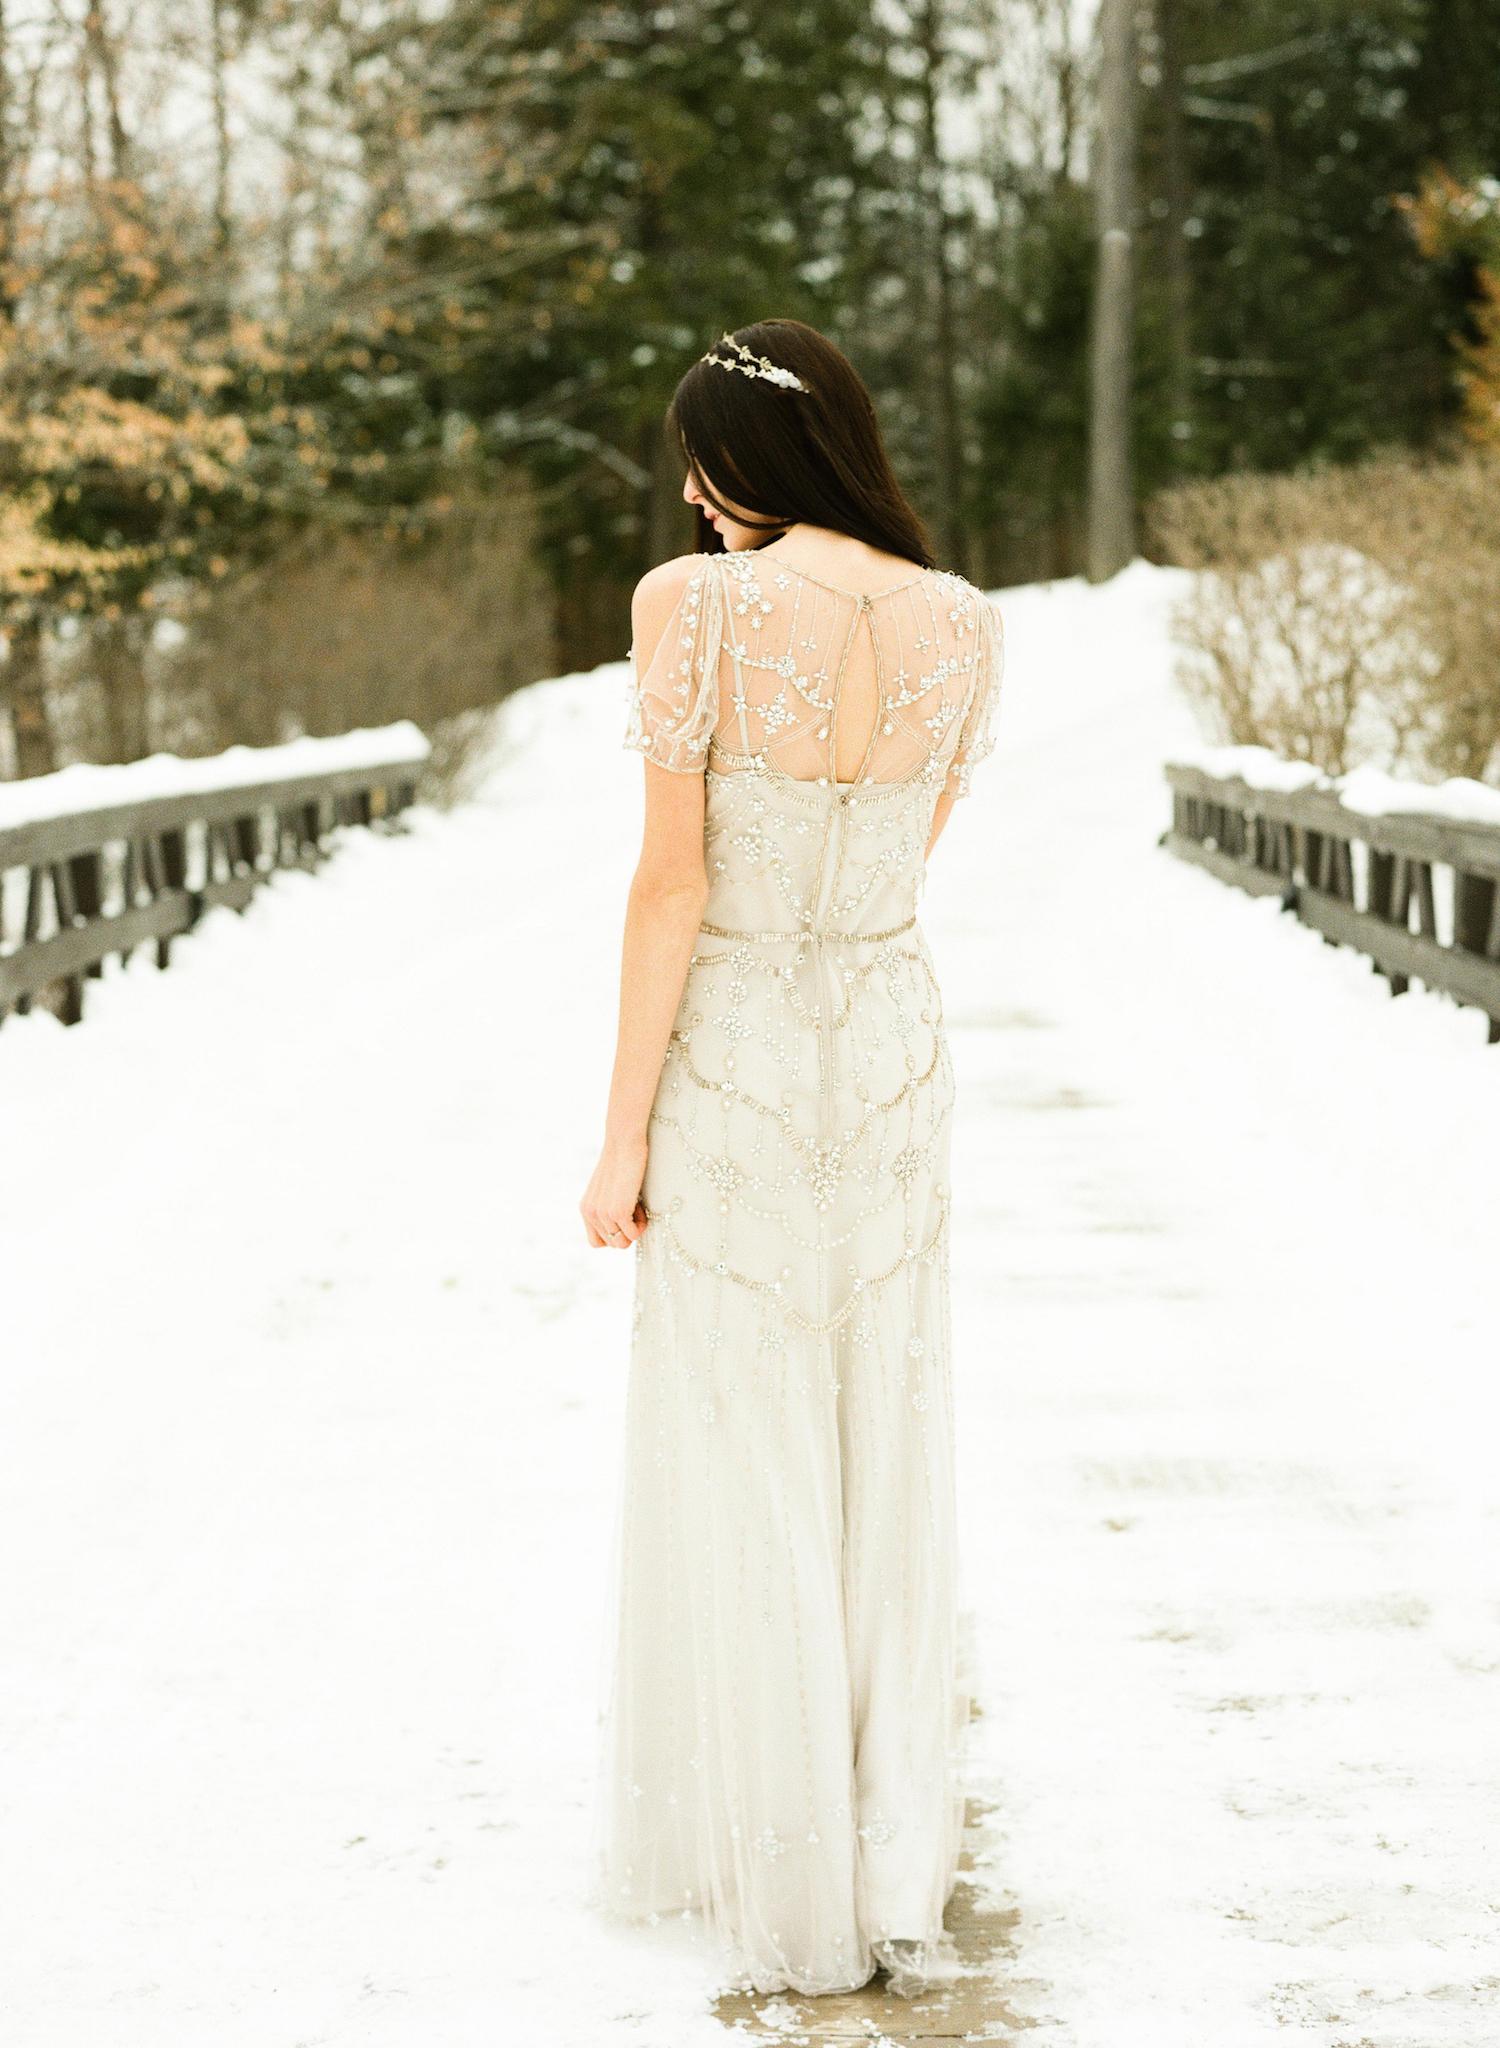 Winter Editorial-JennyPackham-LindsayMaddenPhotography-35 copy.jpg